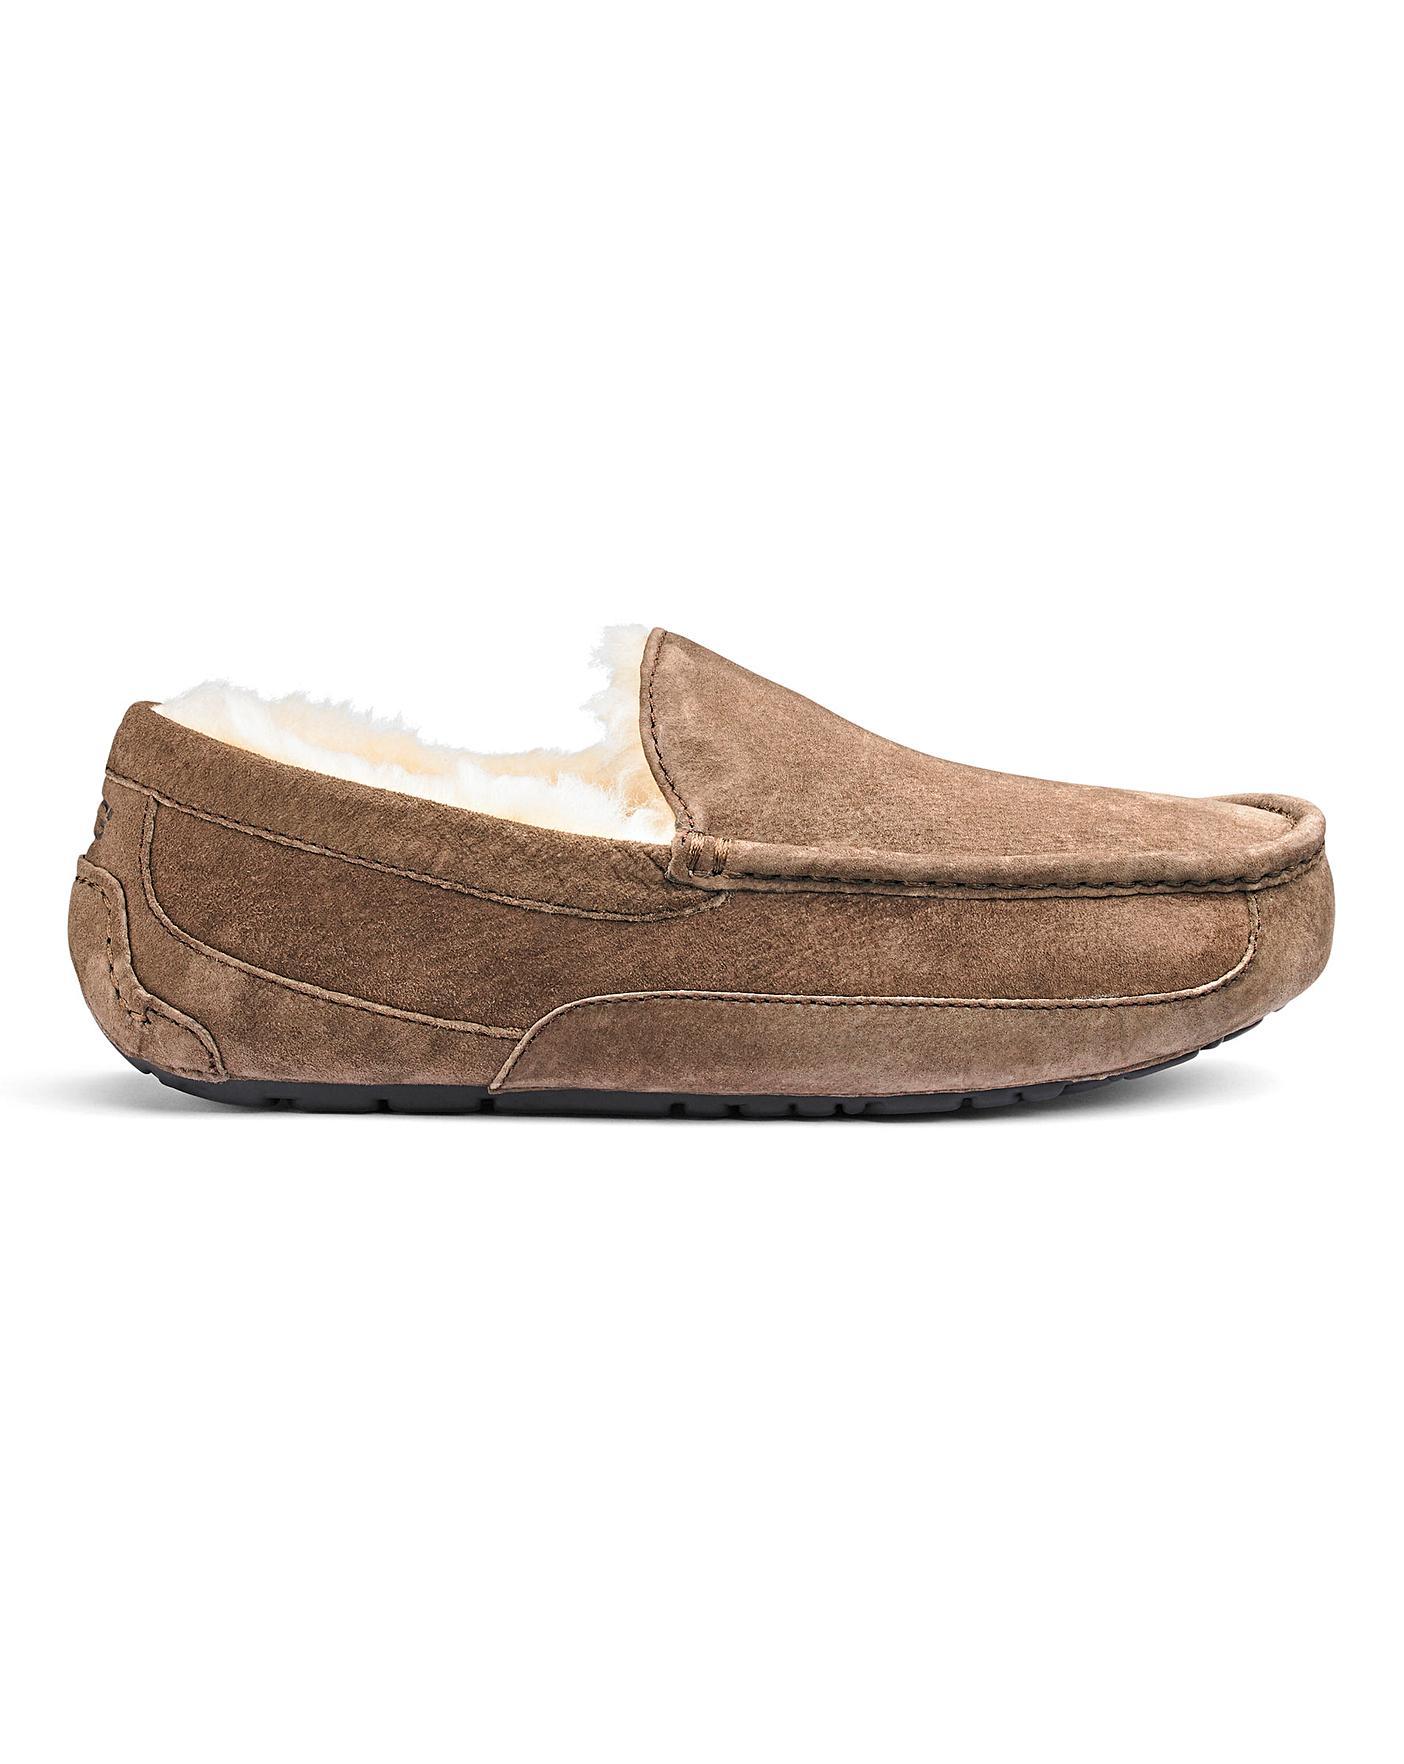 27dec0408fa UGG Ascot Slippers